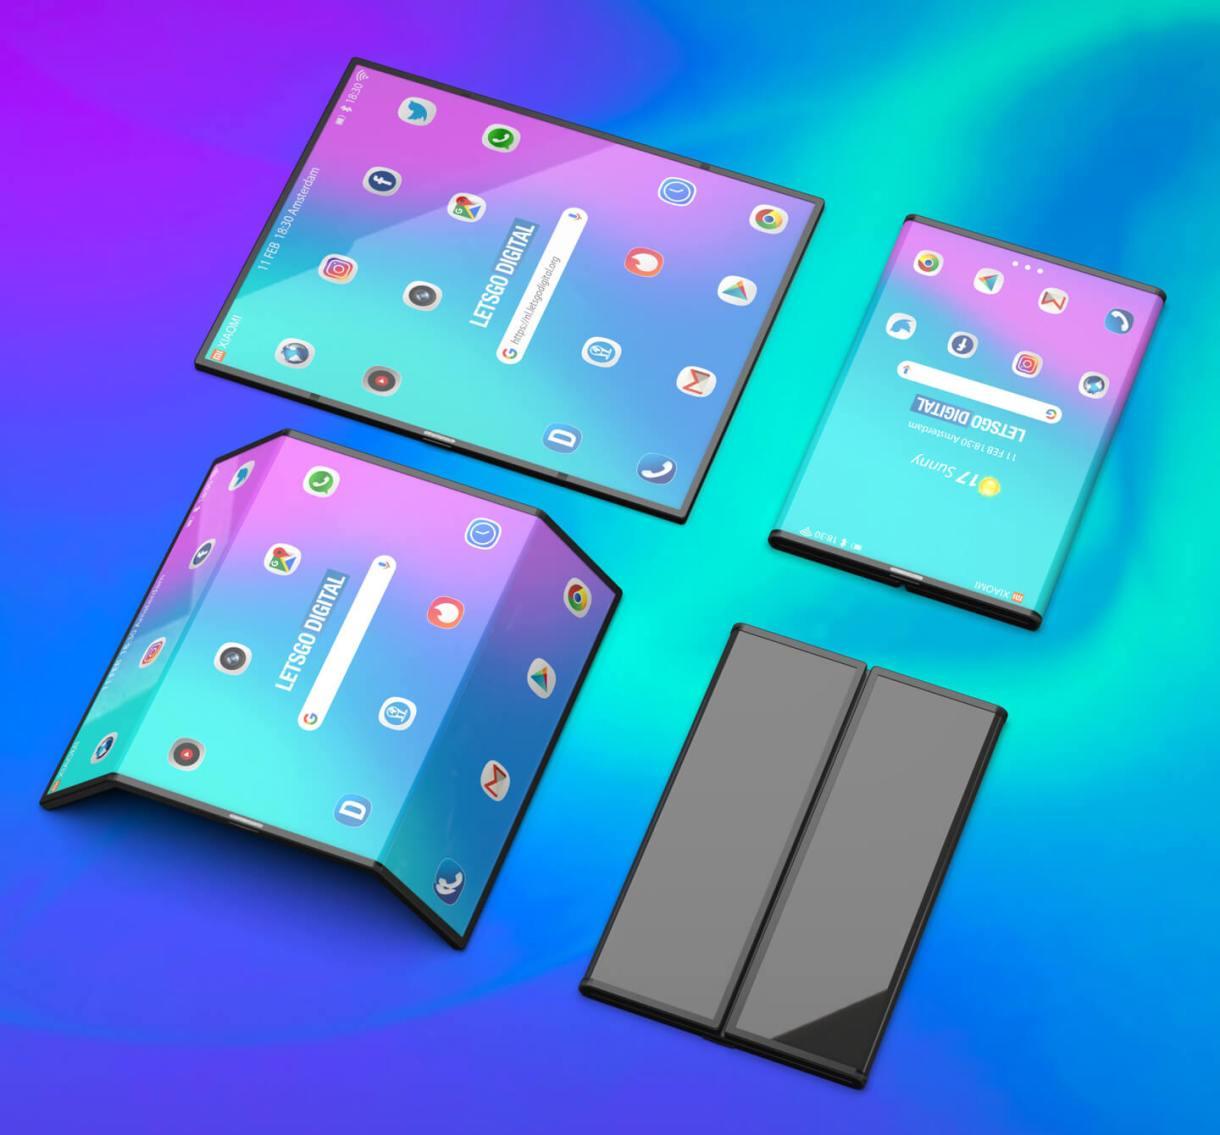 xiaomi-vouwbare-smartphone.jpg?w=1220&ss